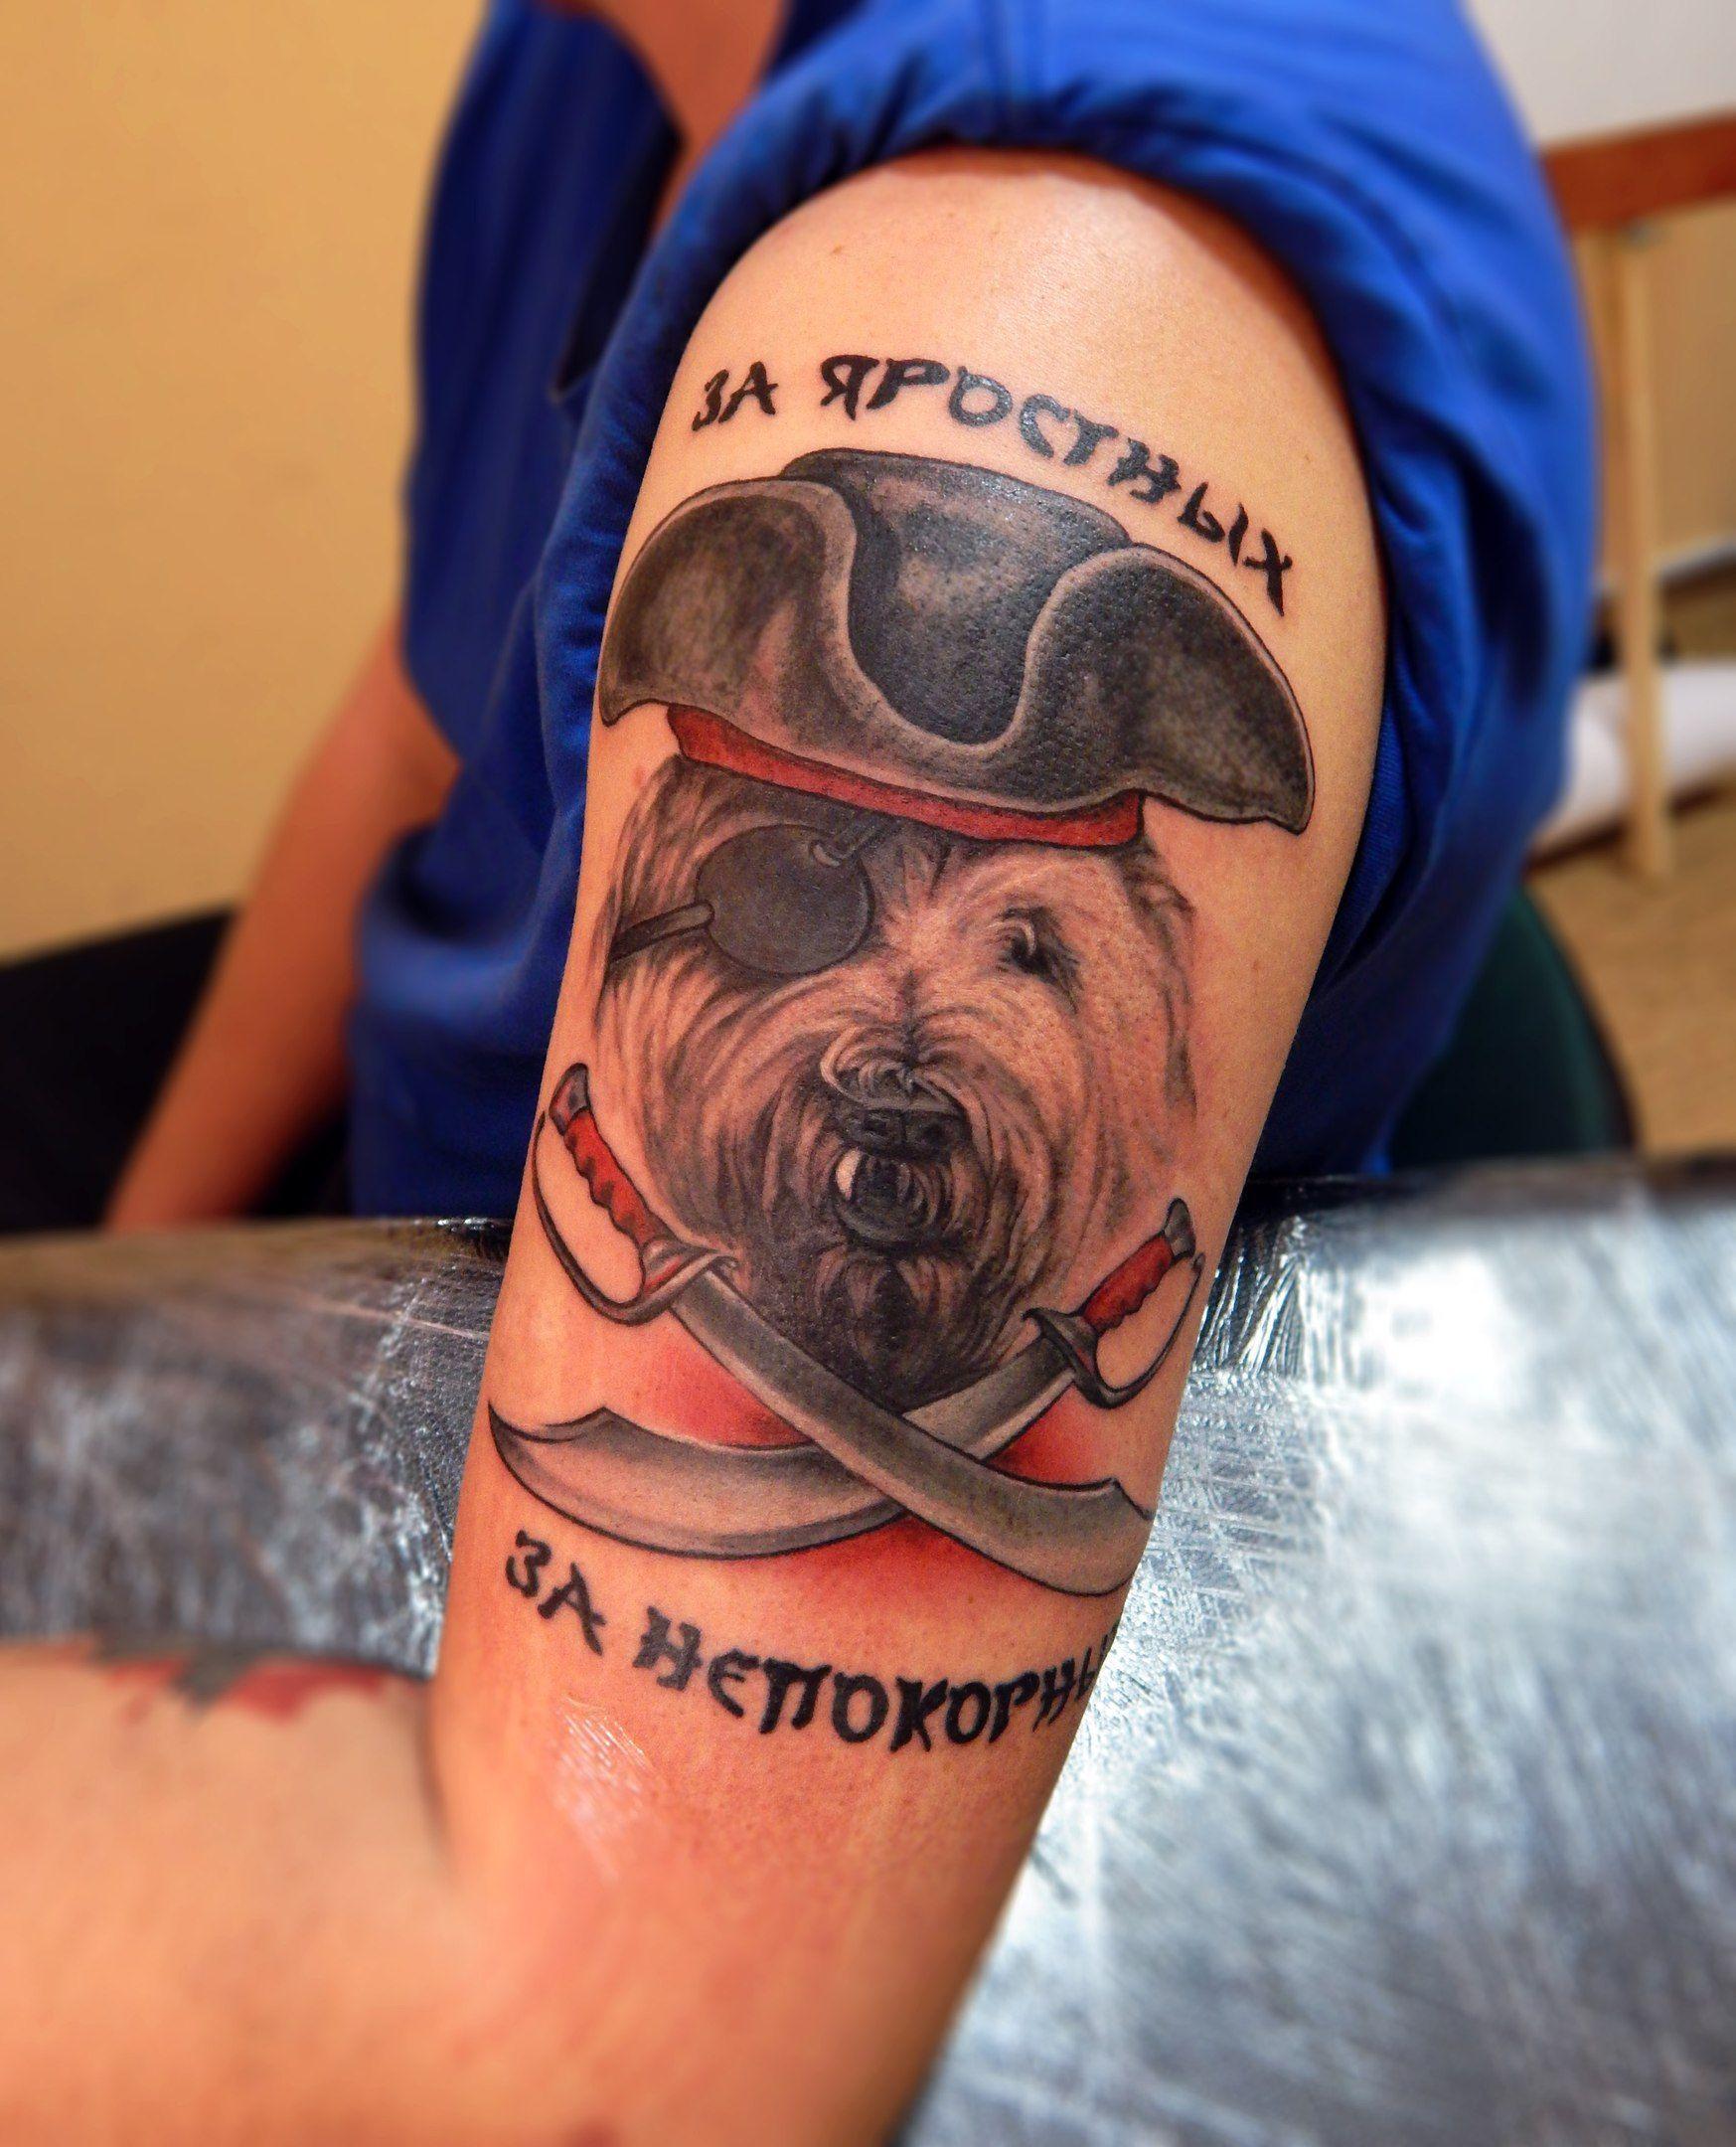 Photo-#Photo- Photo Fernando fernandoinn4457 Tema e idéias para Tattoo Яррр! Кость мне в глотку!#rutabaga #брюква #tattoo #tattooboy #tattooed #тату #tatts #татуировка #tattooartist #sevastopoltattoo #tattoosevastopol #ink #sevastopol #sevas #Севастополь #цвет #inkpeople #tattoolife #style #плечо #SouthRussianShepherd #sheepdog #собака #веселый #роджер #сабли #текст #Южнорусская #овчарка #клык #пират #треуголка #dog #Jolly #Roger #saber #text #fang #pirate #cocked #hat  Fernando  Яррр! Кость мн